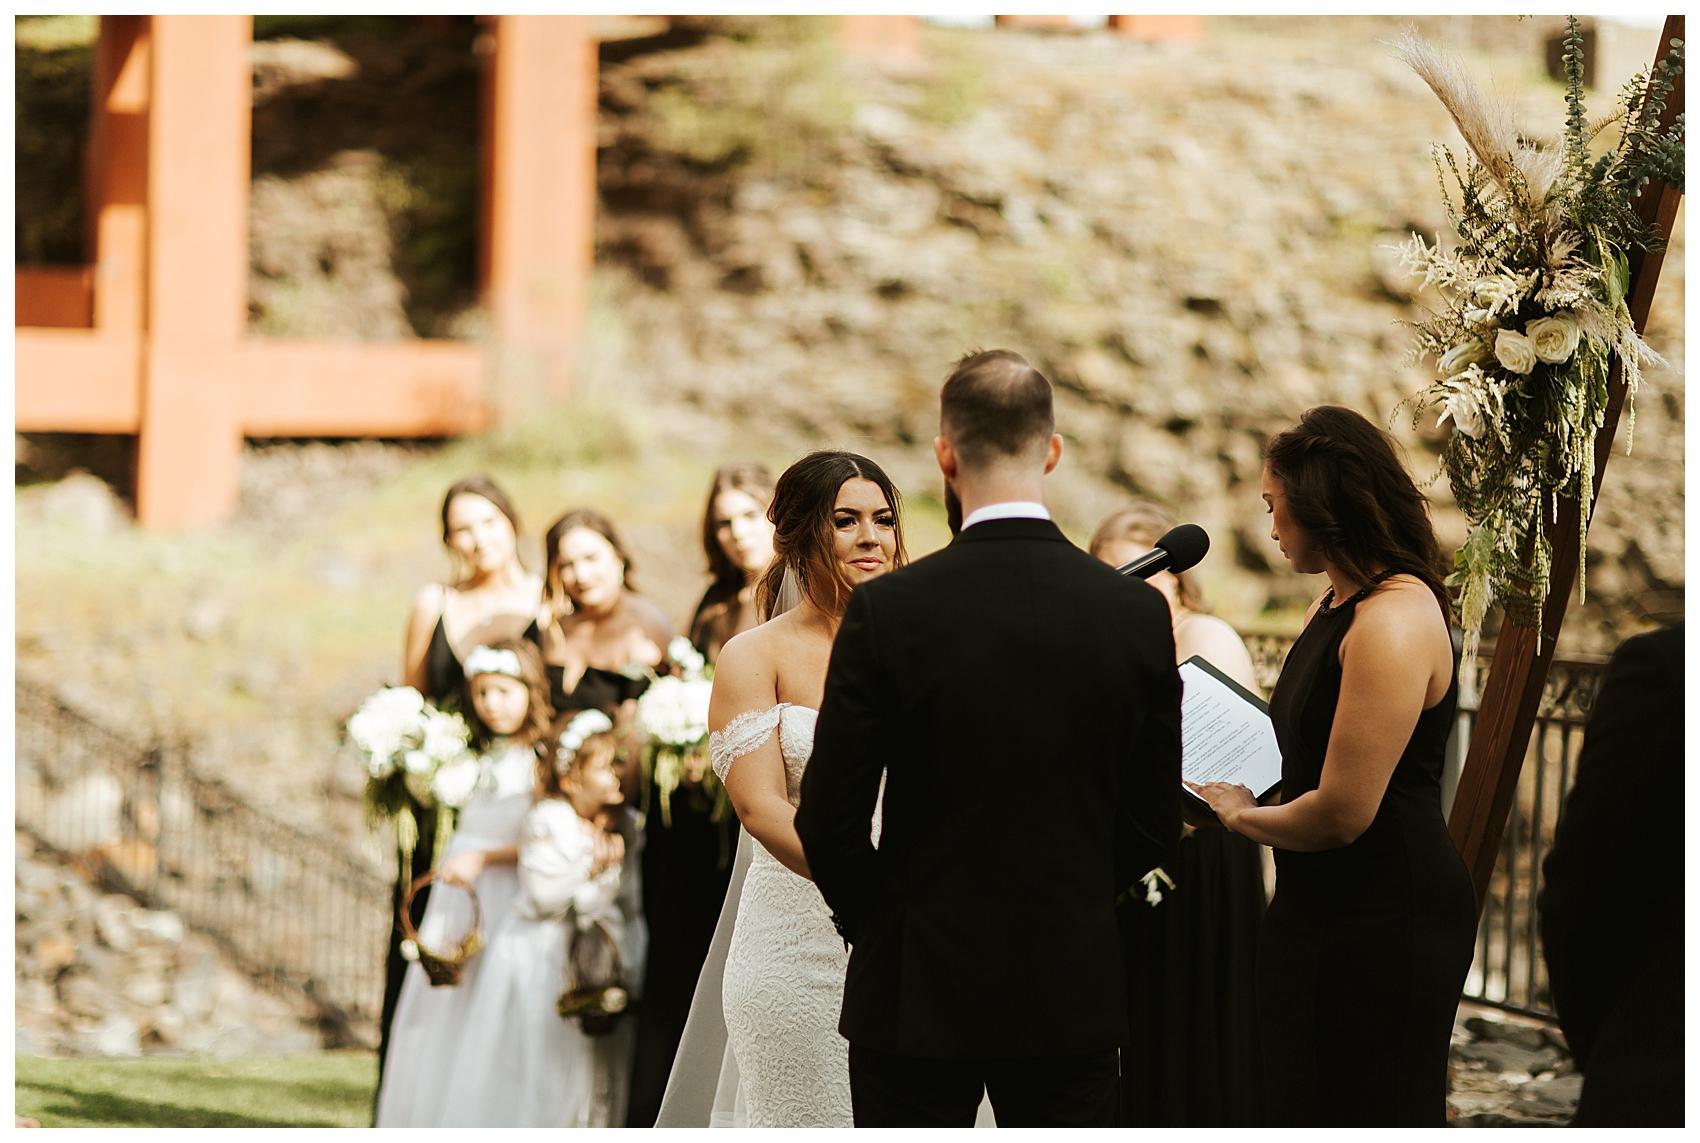 Chateau Rive Spokane Wedding Cassie Trottier Photography01055.jpg